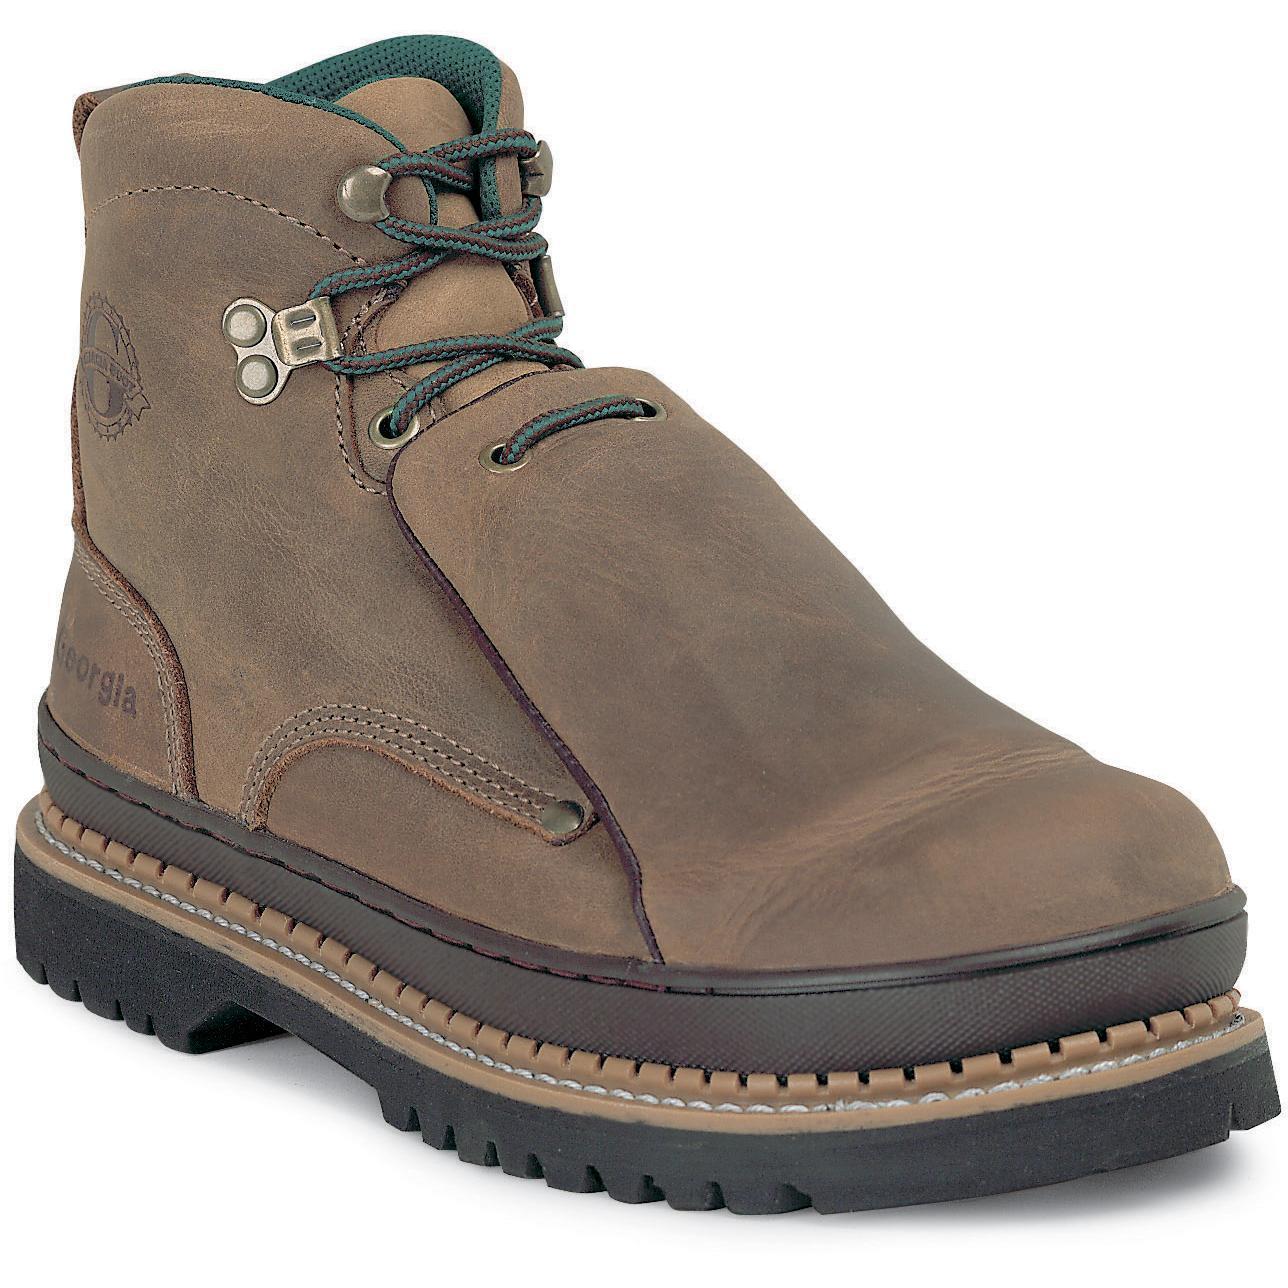 Fashionable steel toe work boots 84